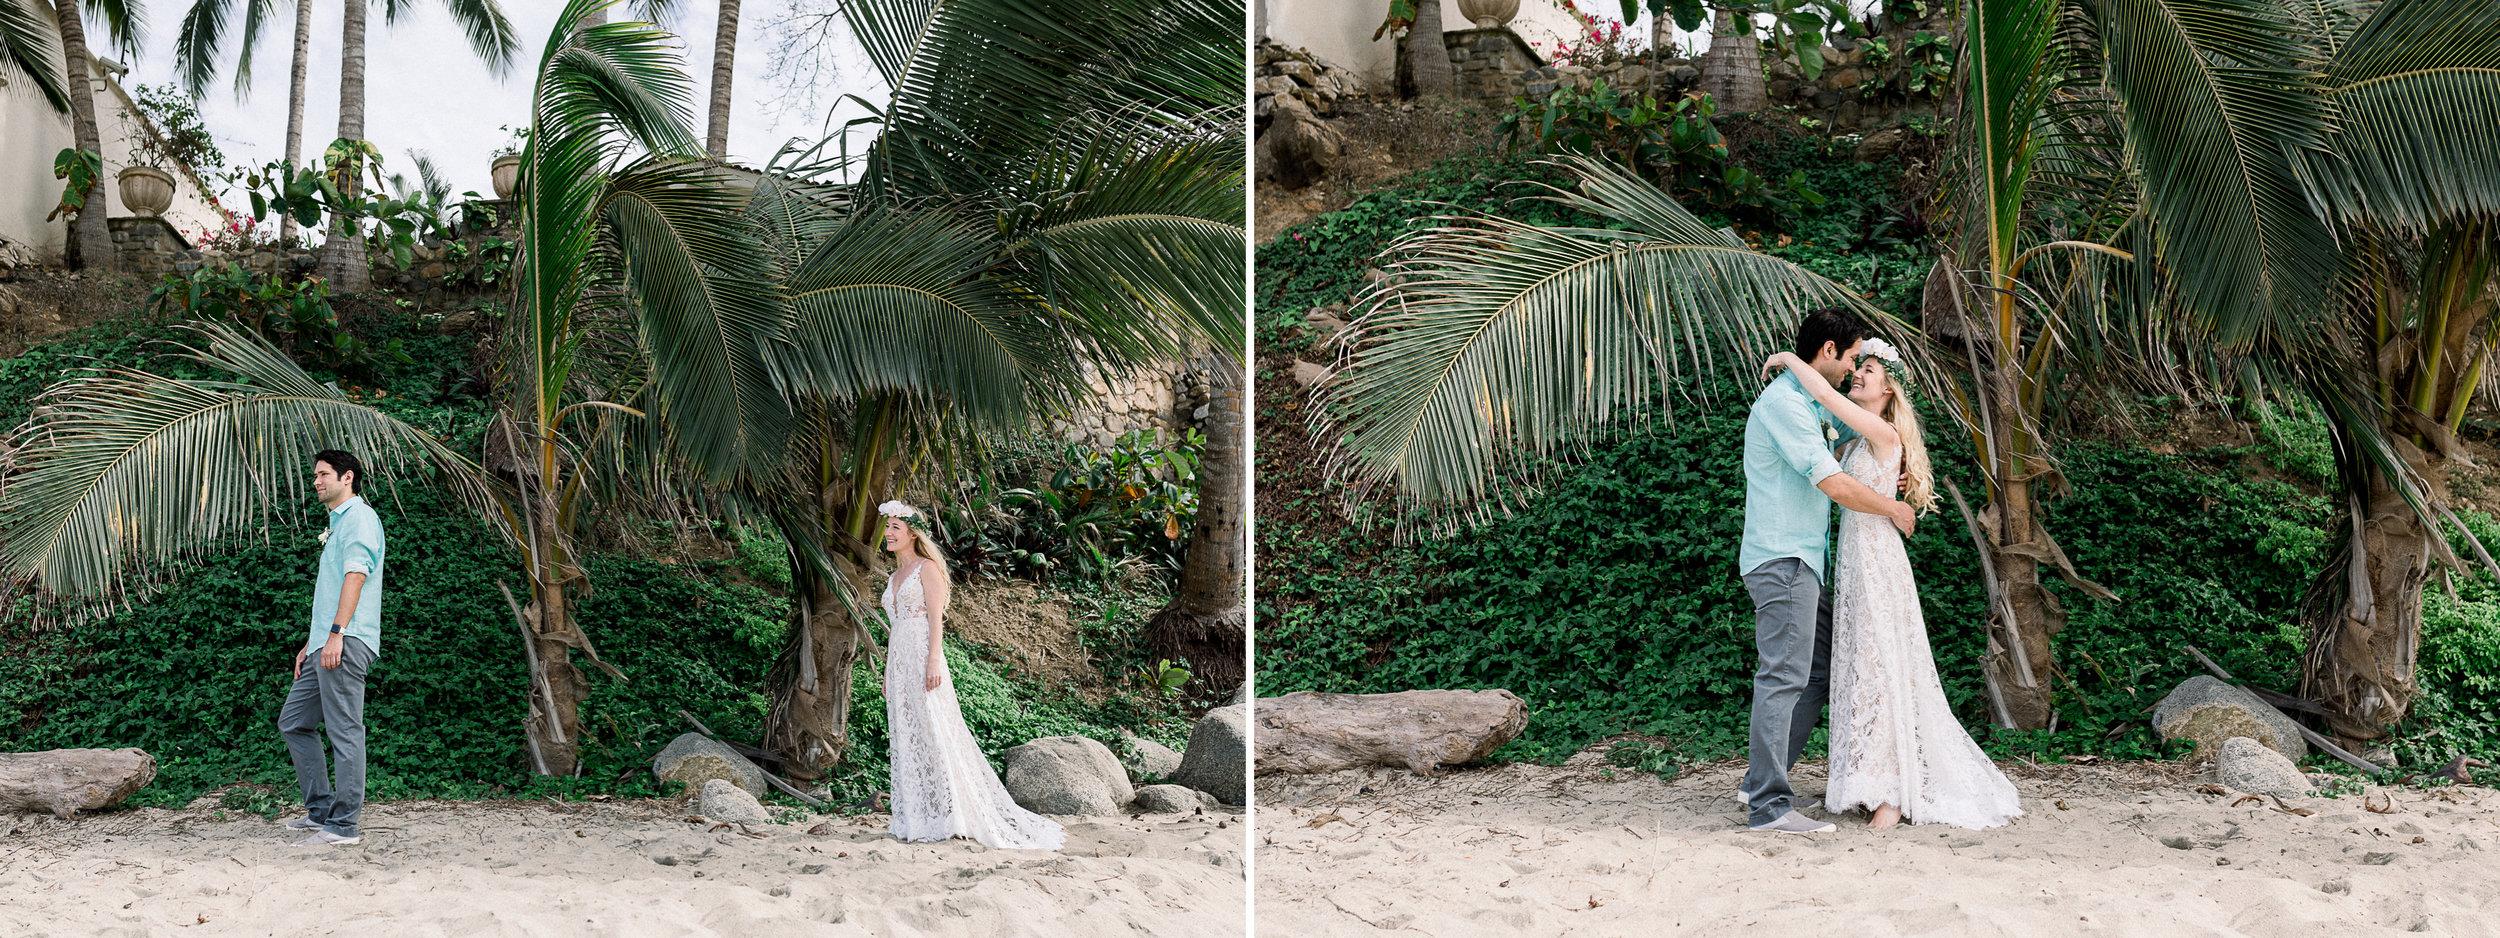 mexico Destination Wedding photographer